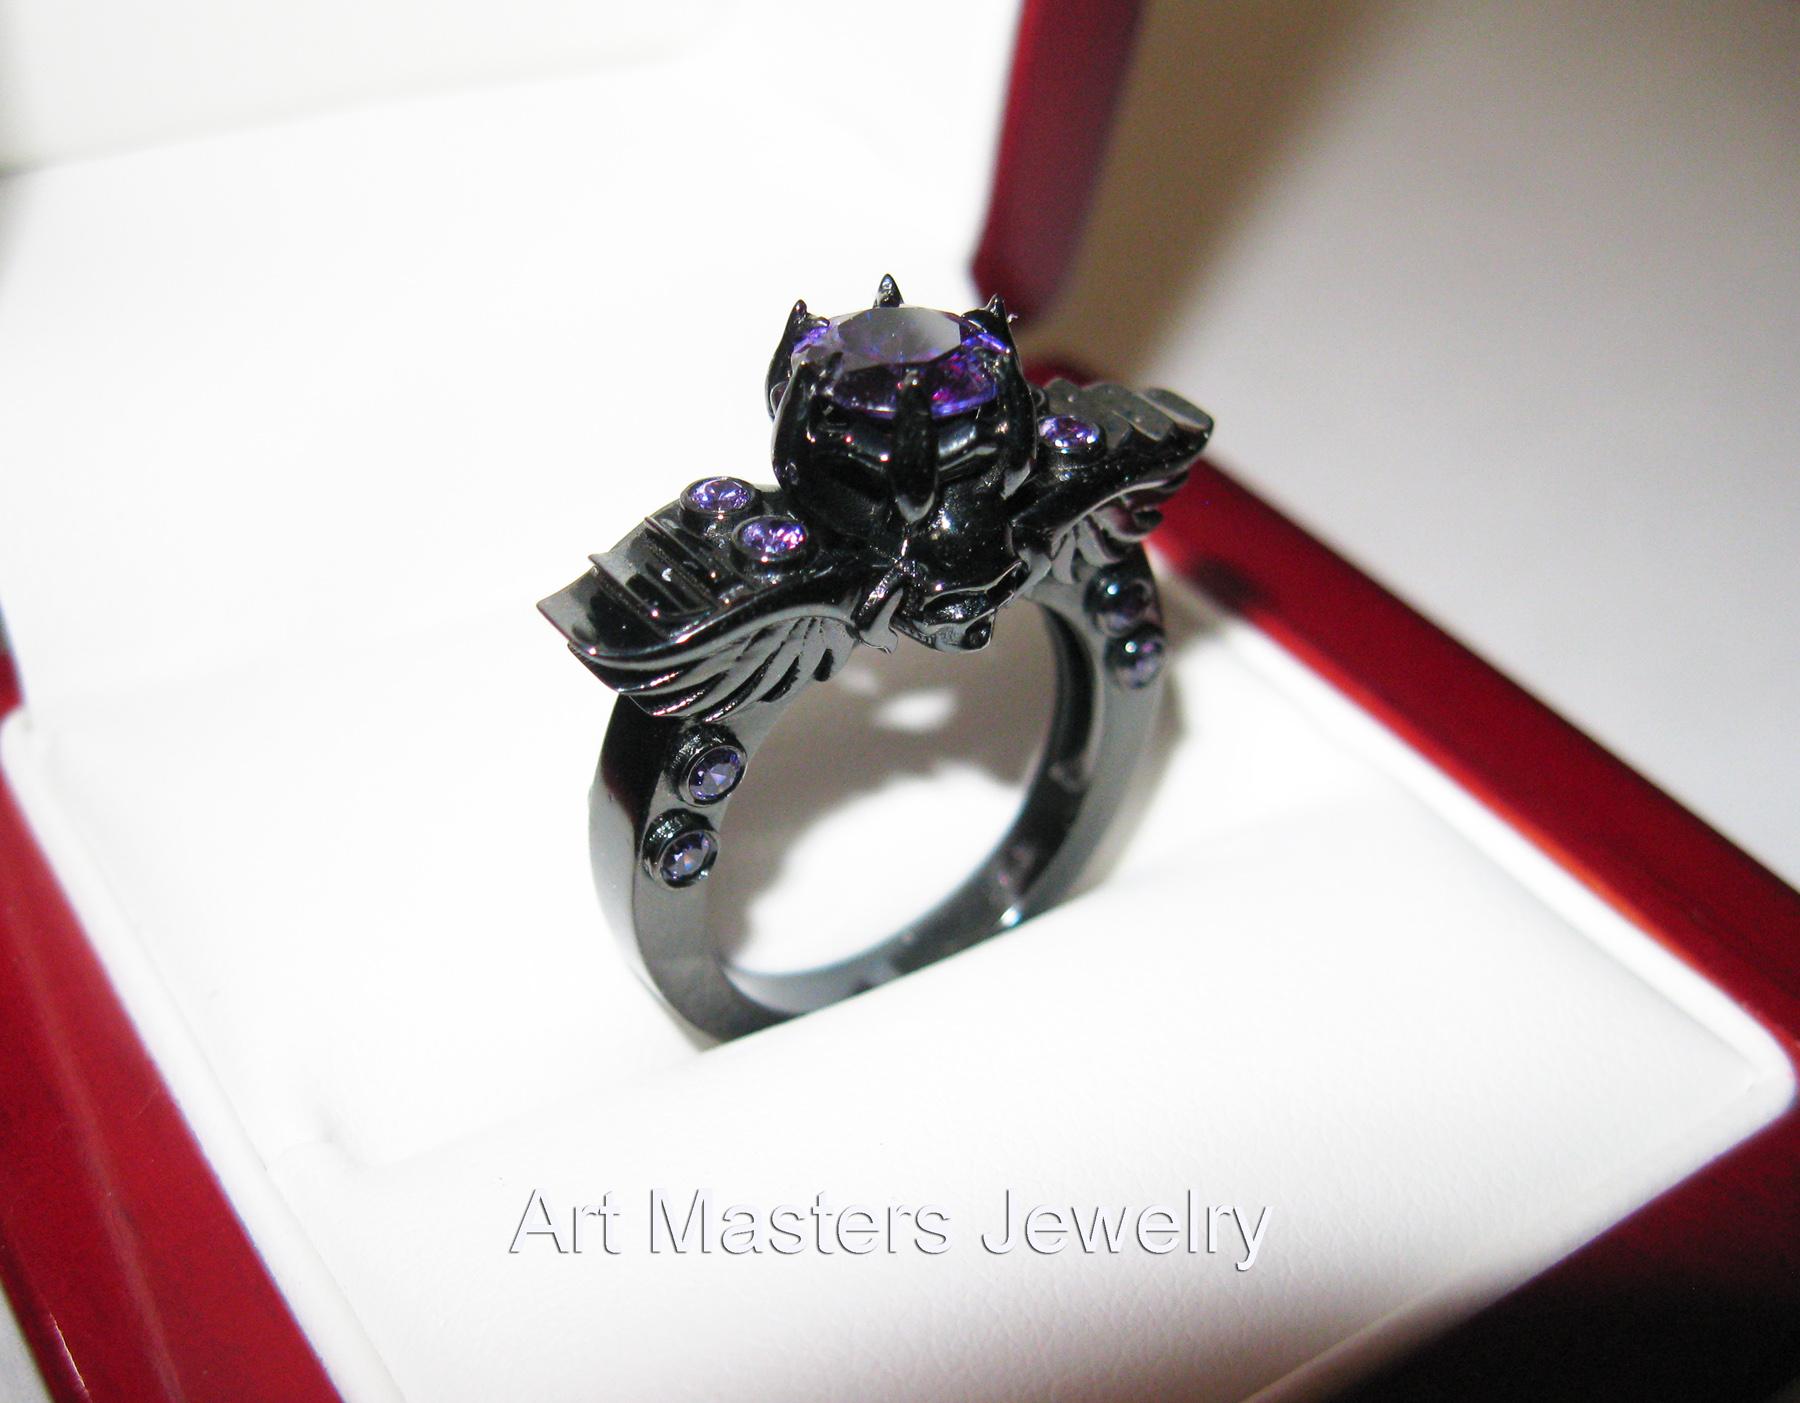 winged skull ring skull wedding rings Art Masters Classic Winged Skull 14K Black Gold 1 0 Ct Amethyst Solitaire Engagement Ring R